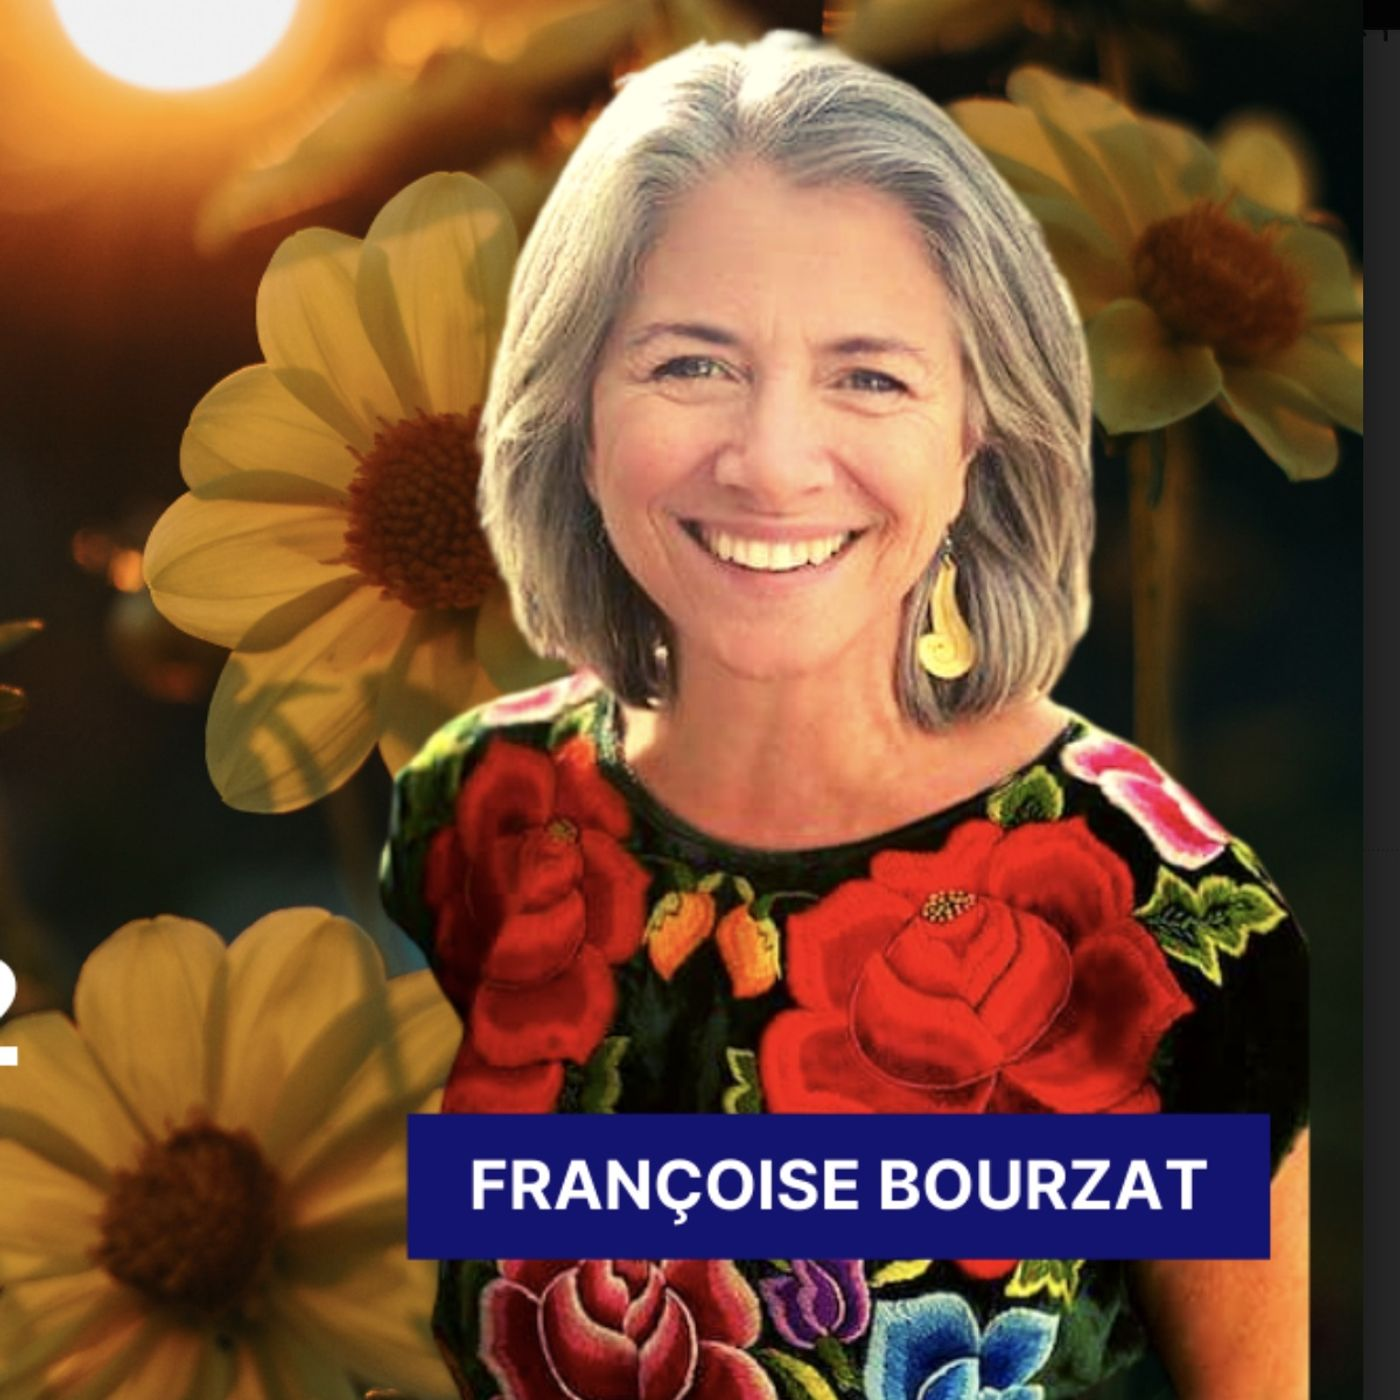 Françoise Bourzat - Mind, Body, Health, and Politics